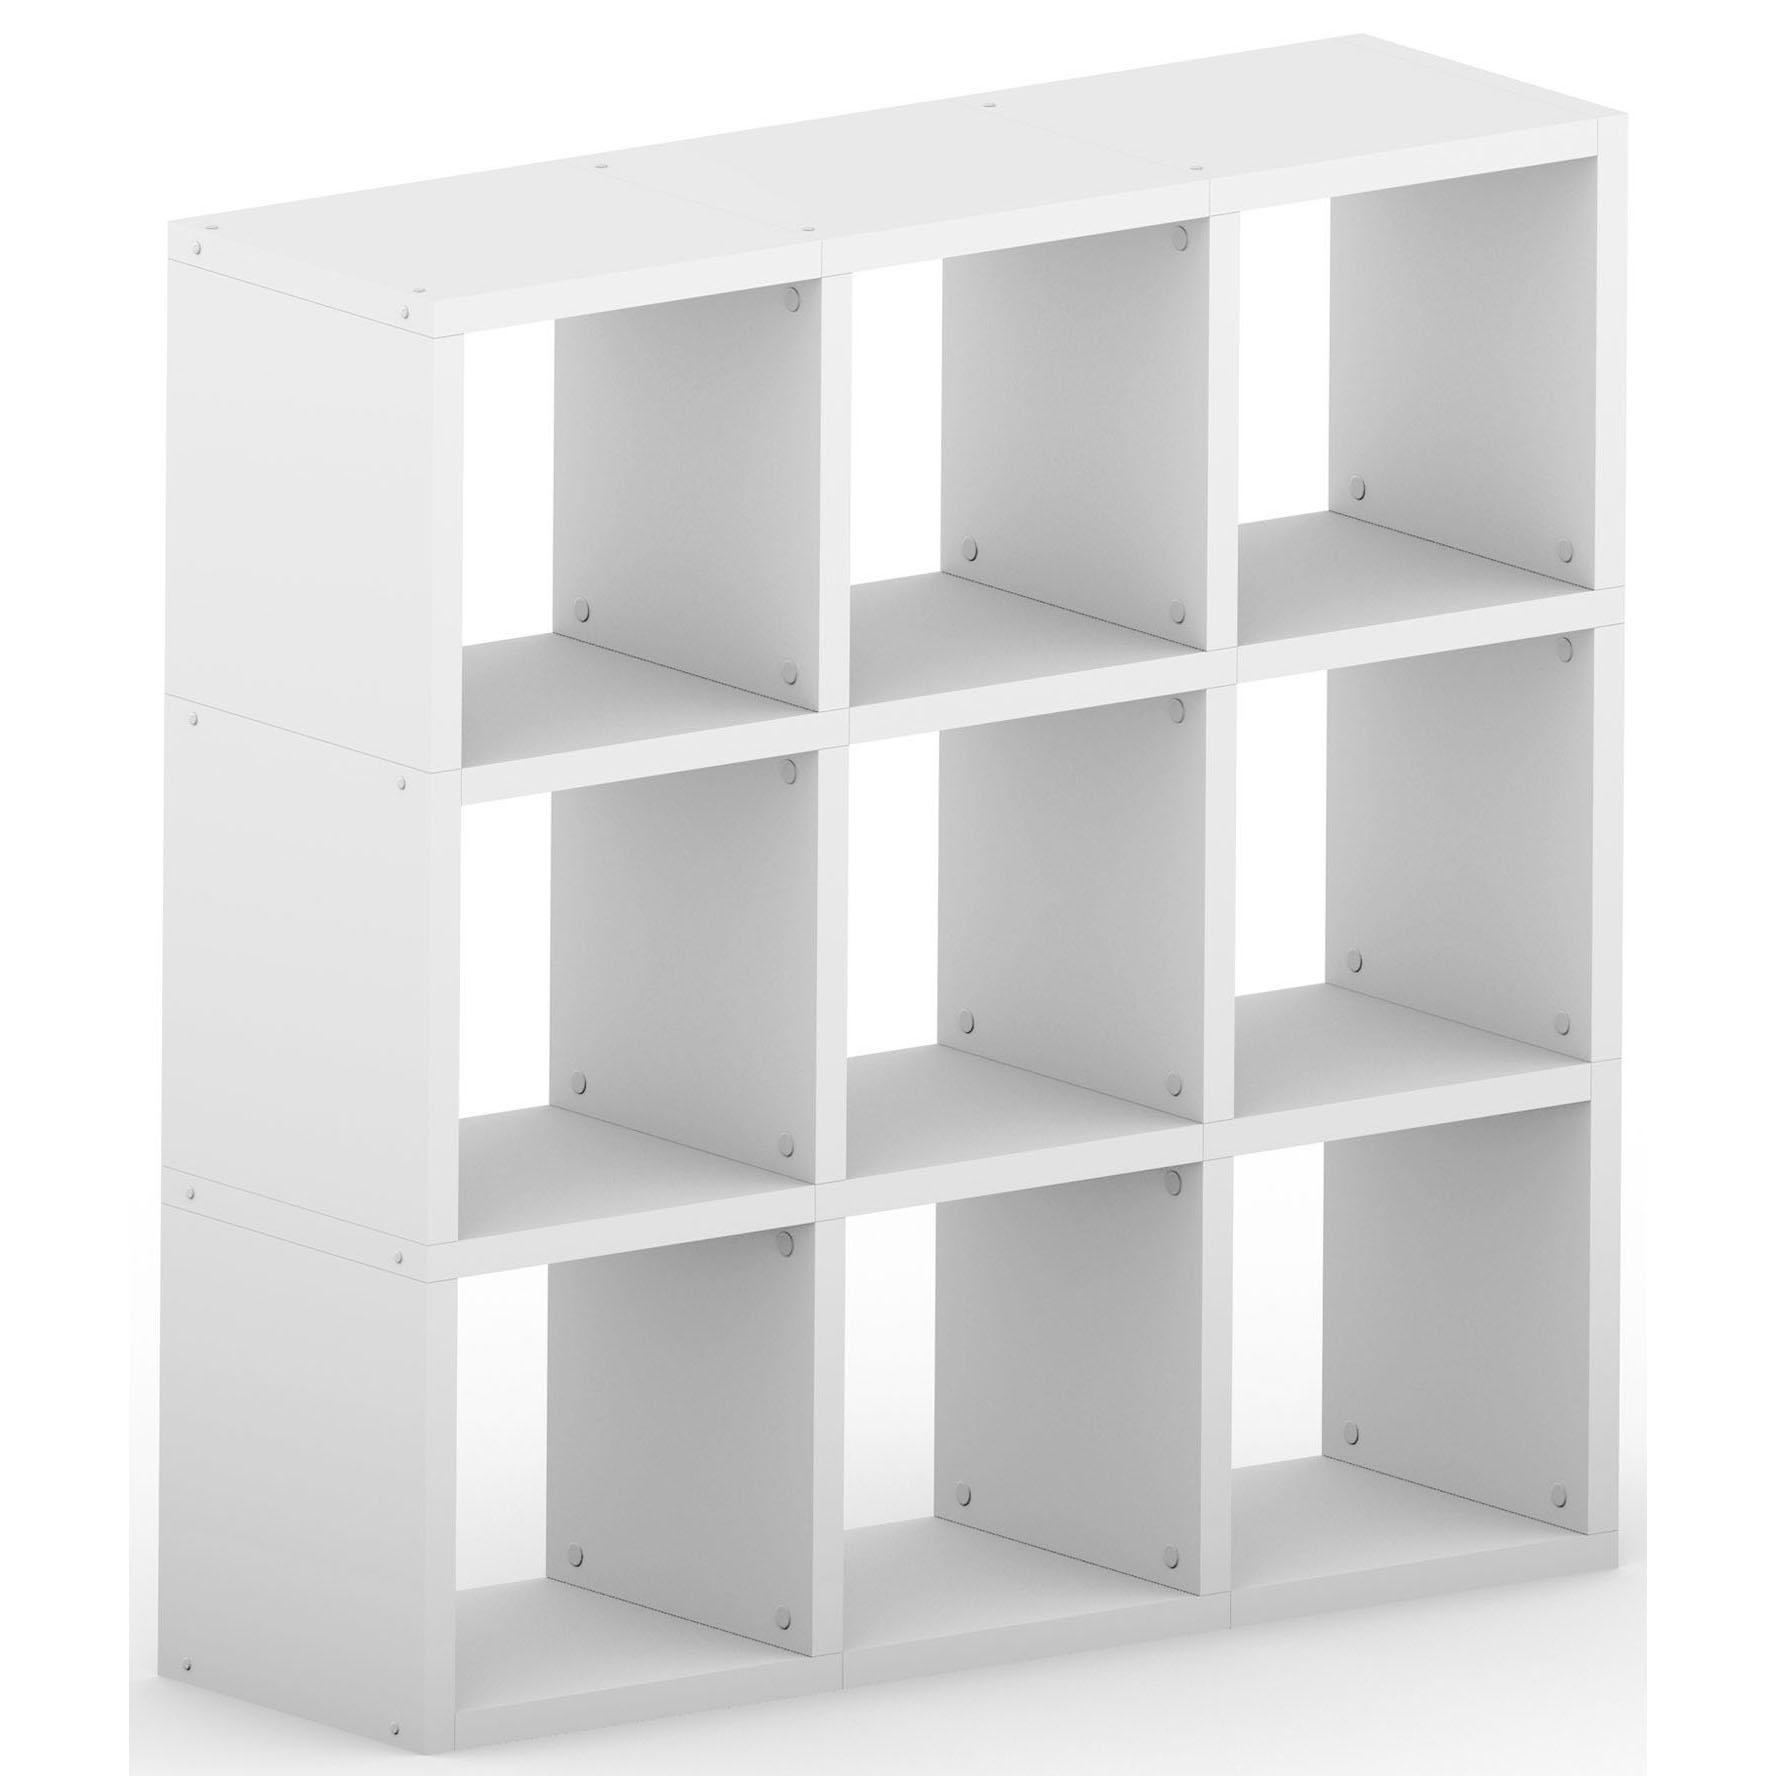 Modular 9 Cube White , 1096L x 1096H x 328D